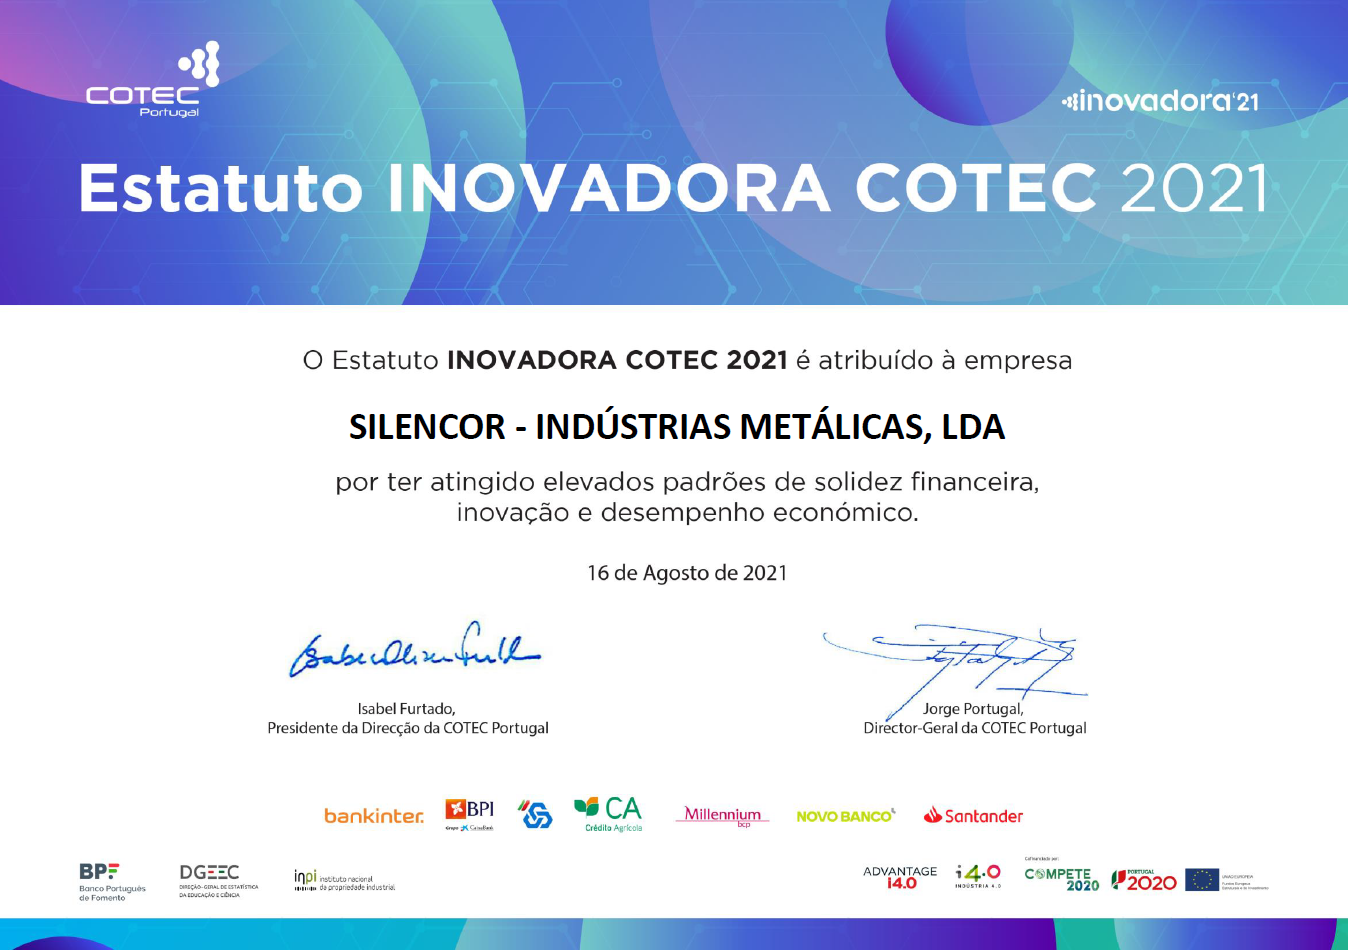 Certificado Estatuto INOVADORA COTEC 2021